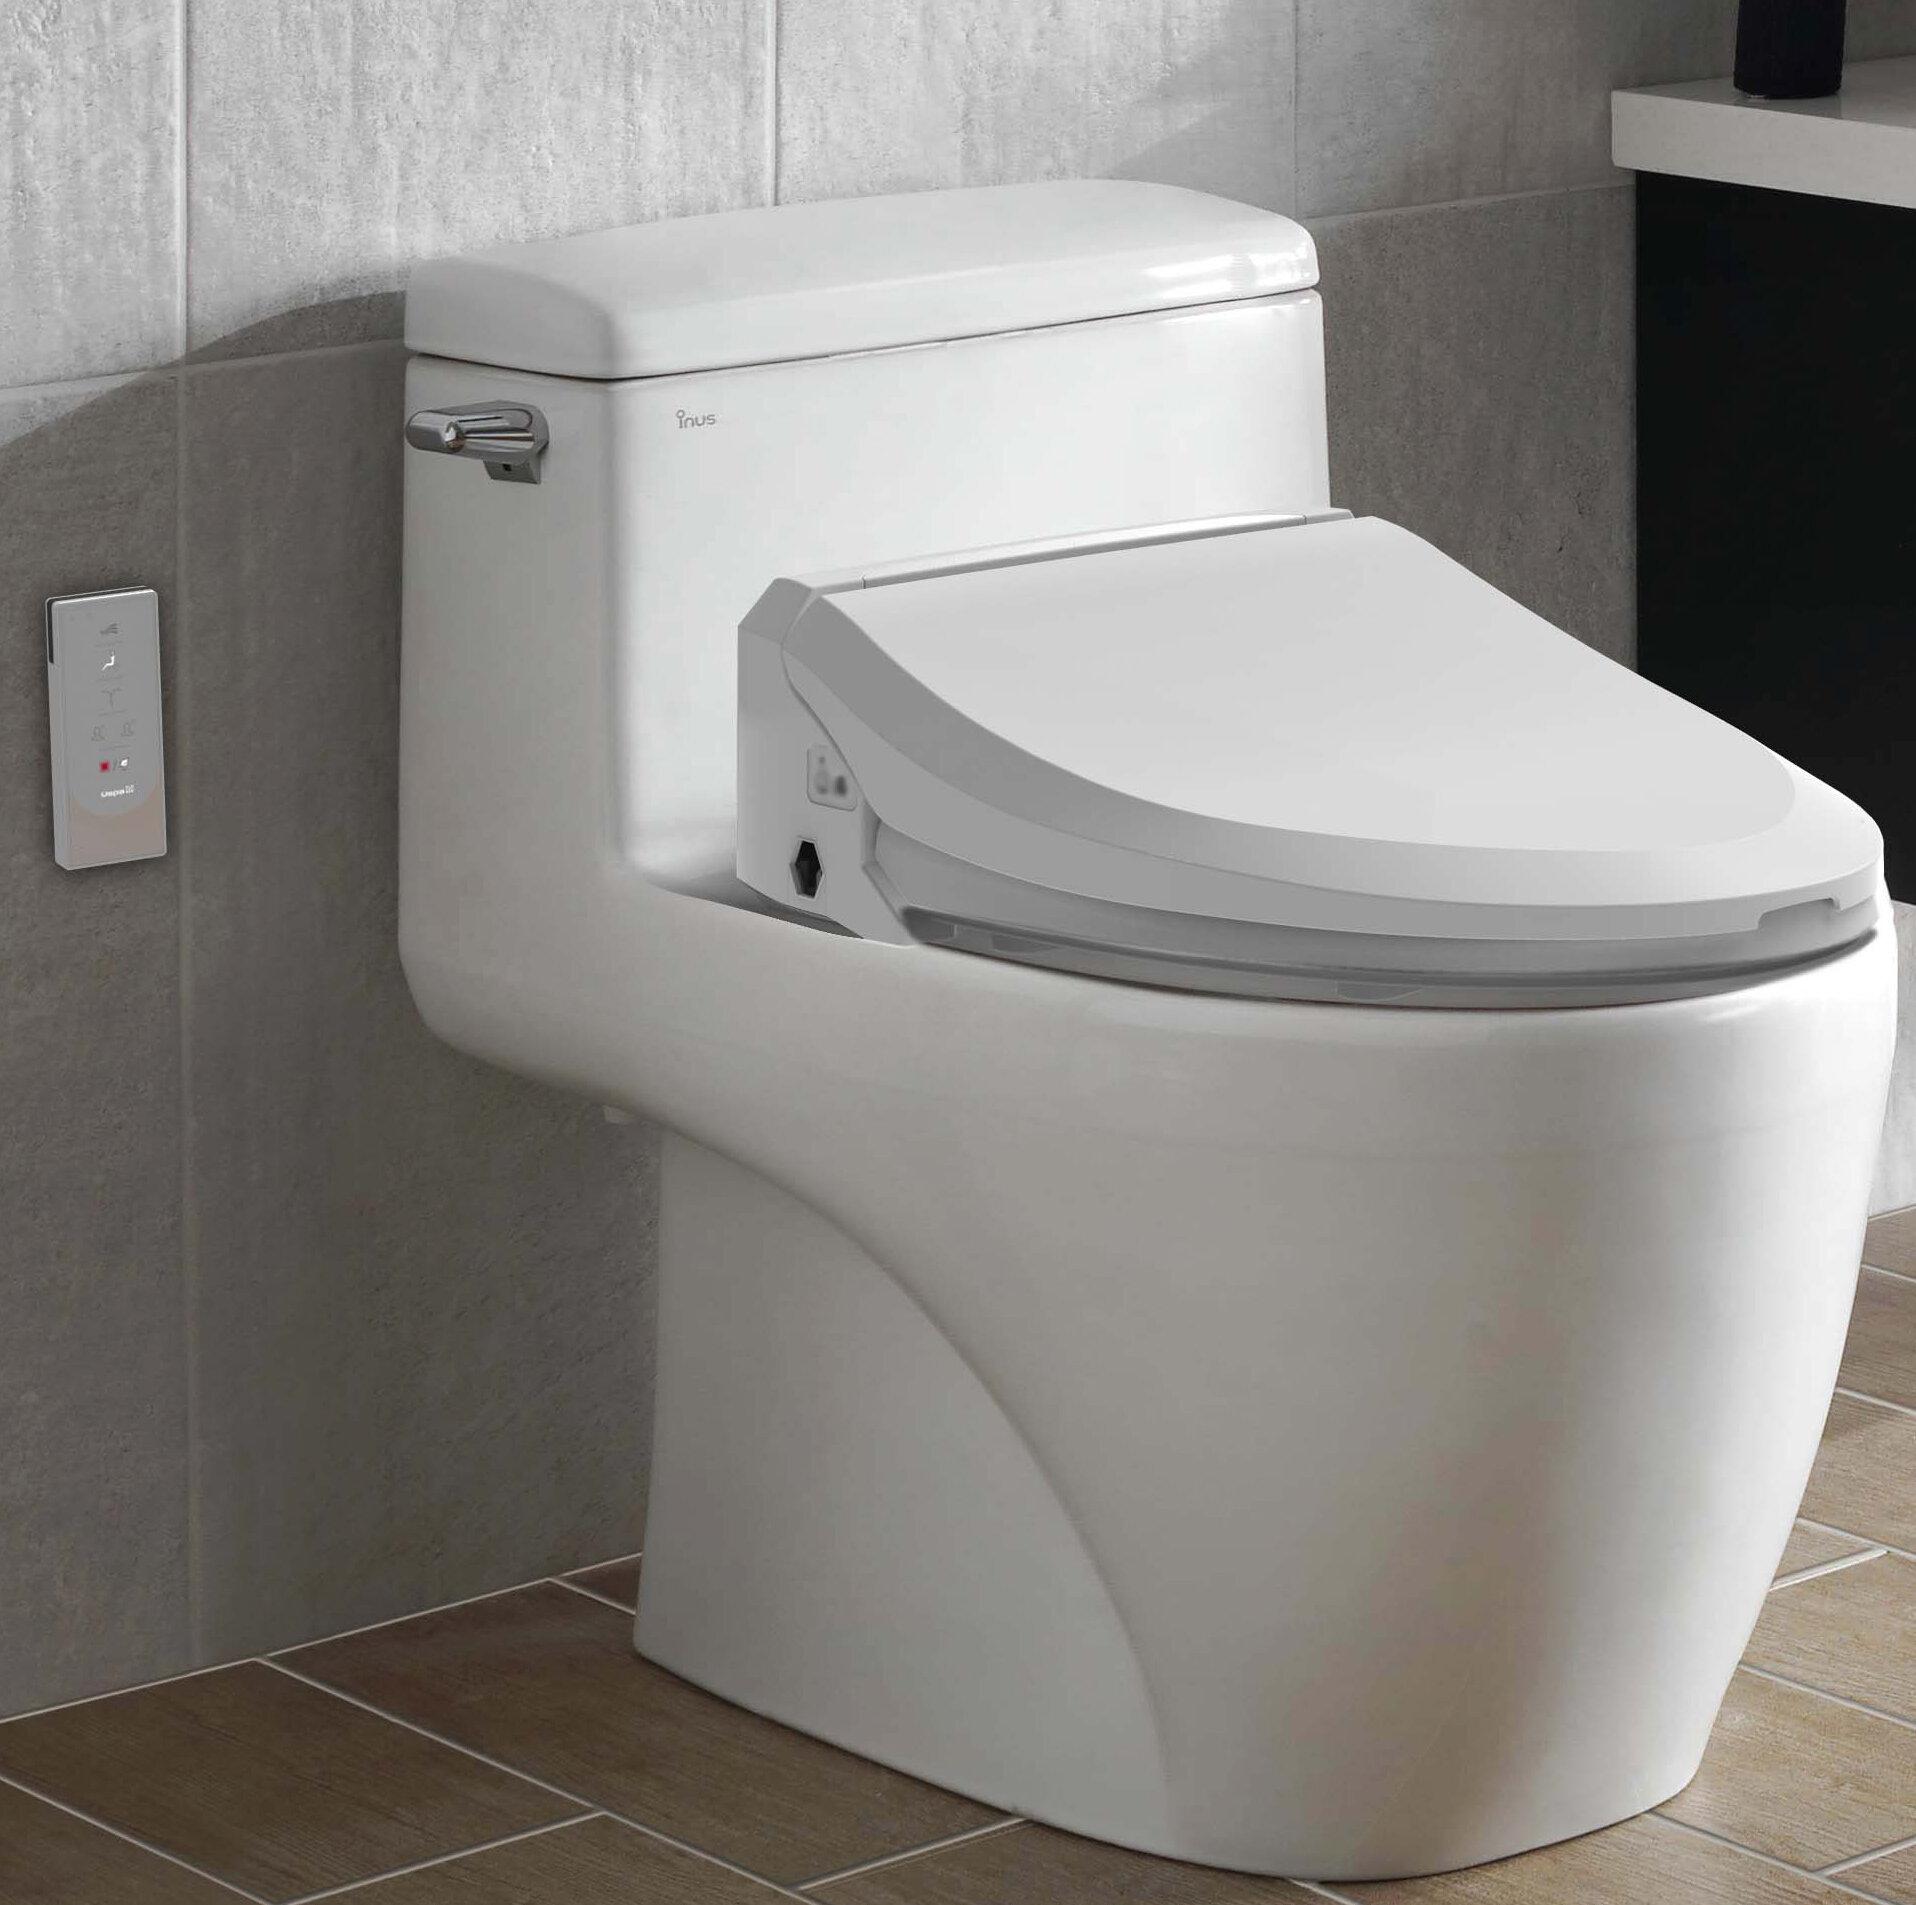 Round Bio Bidet Slim Three Electric Self-Cleaning Bidet Warm Toilet Seat